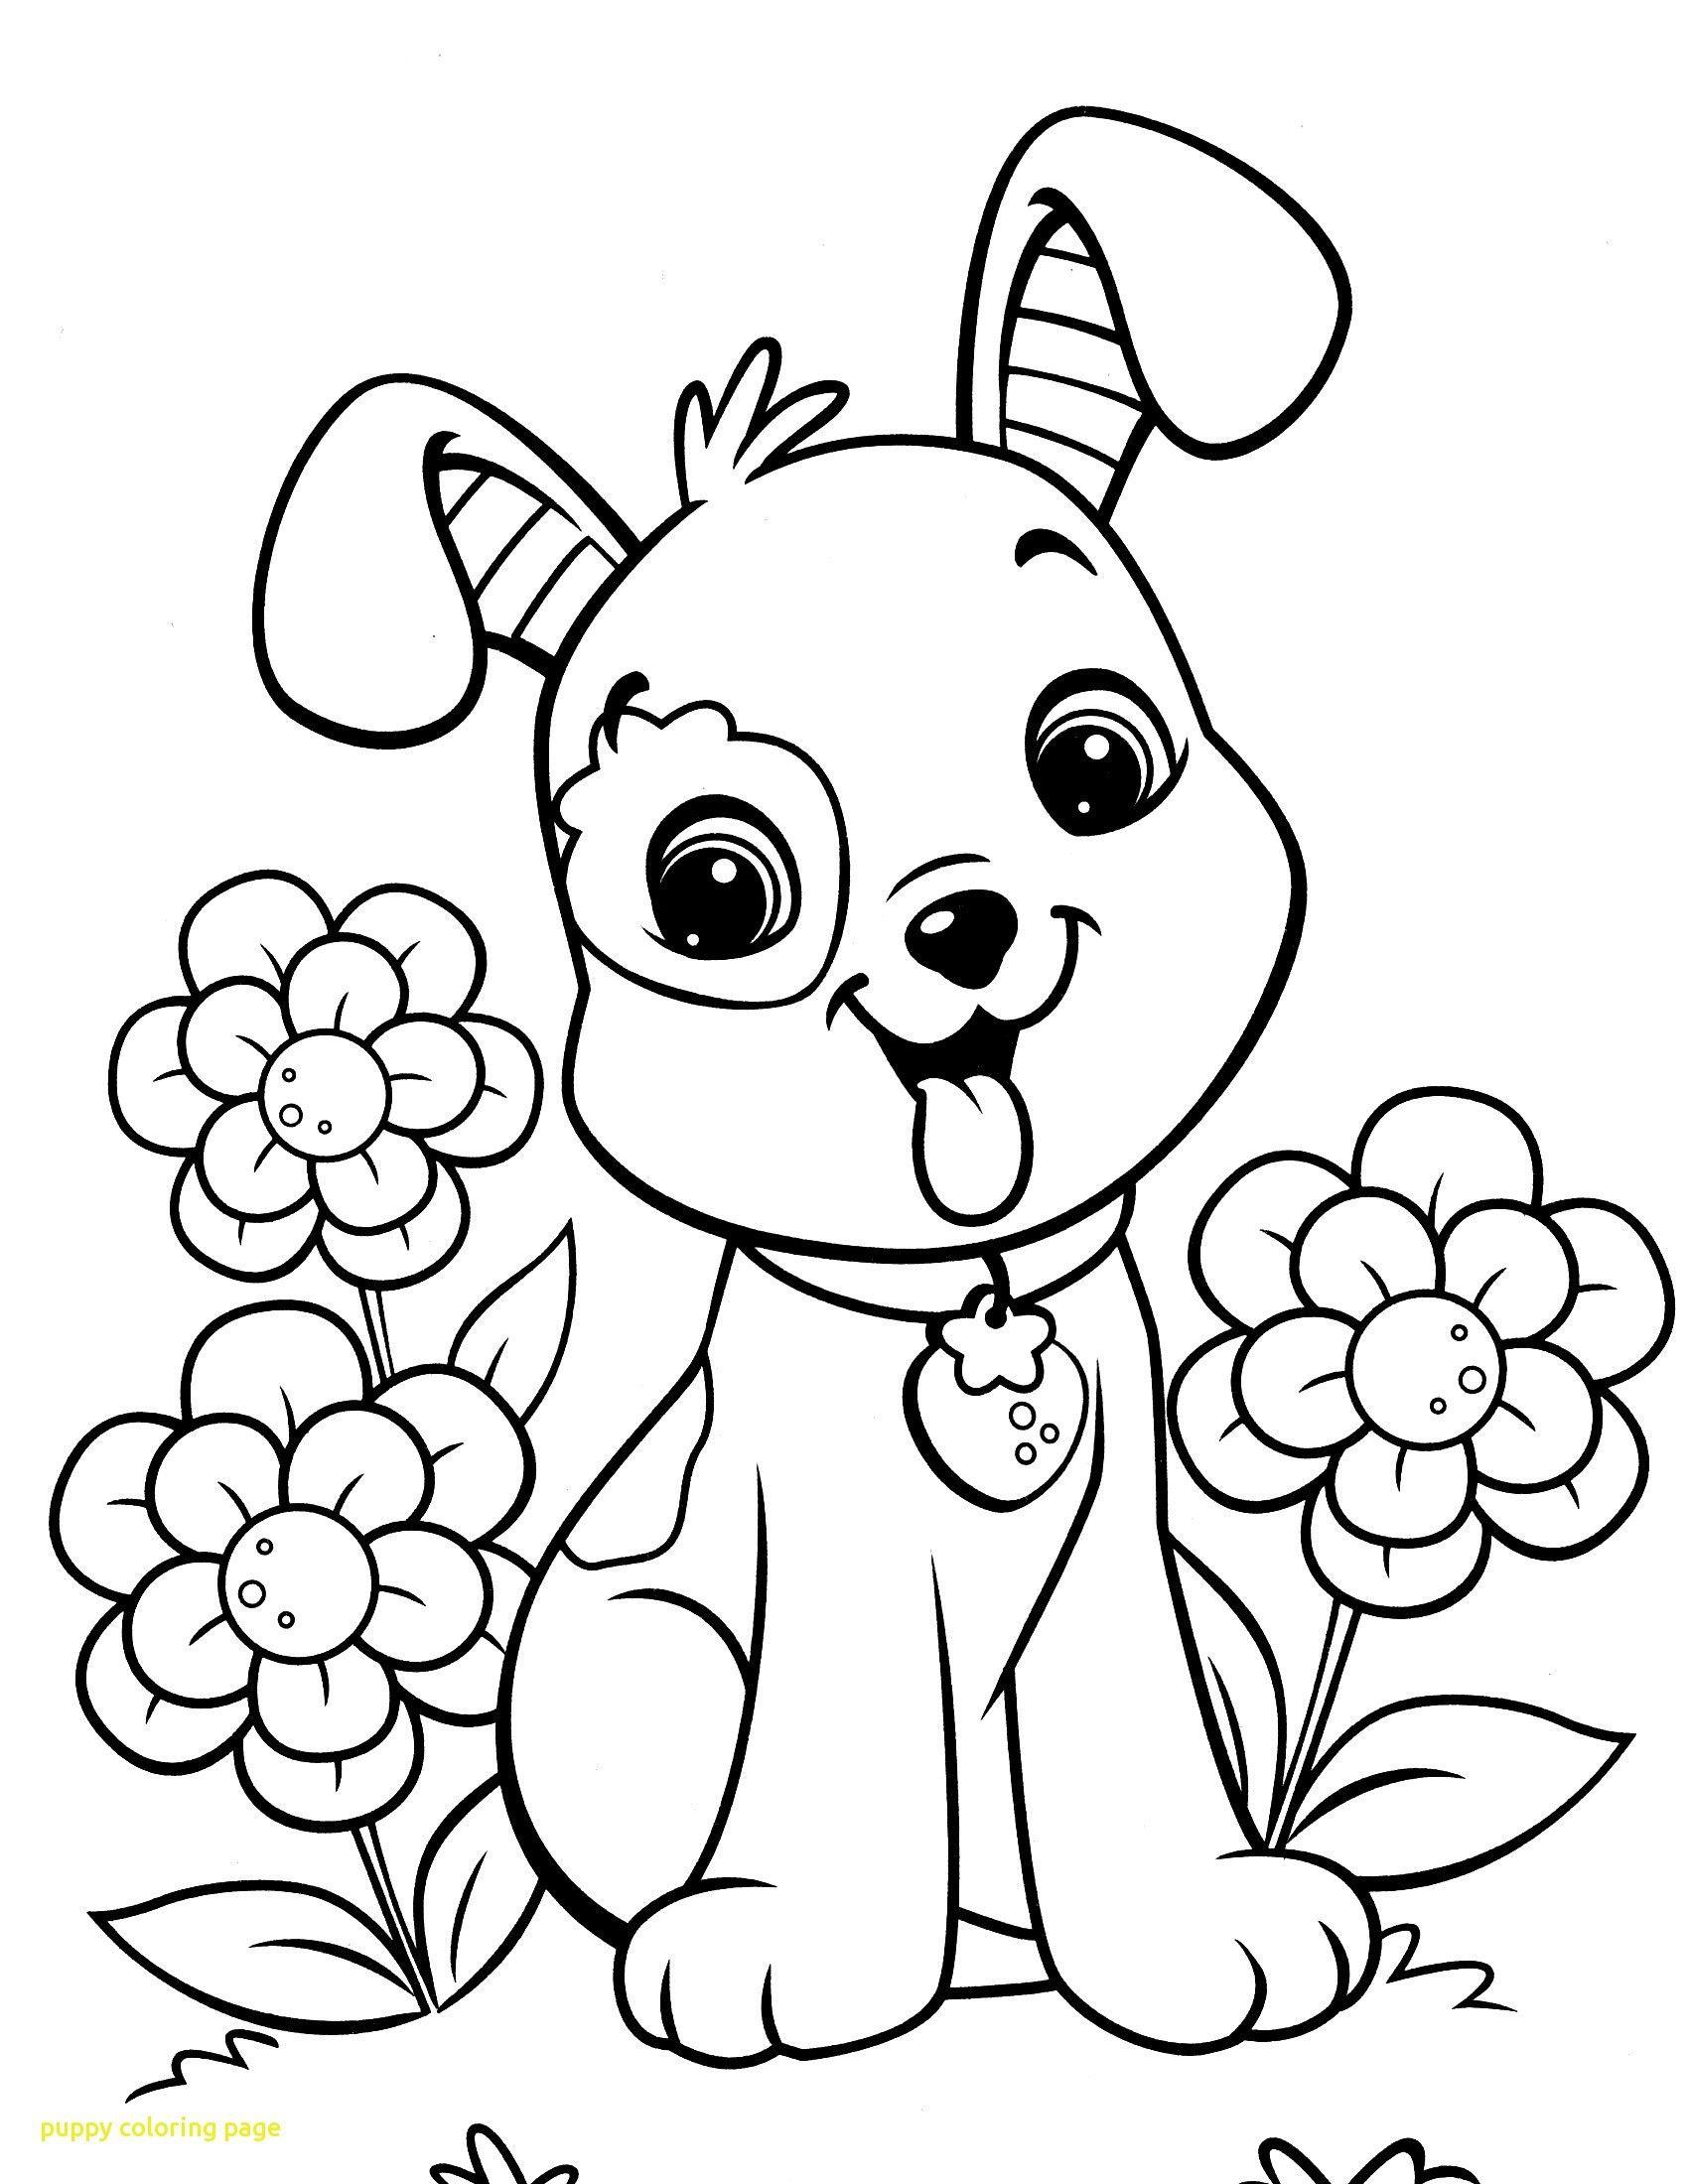 Free Puppy Coloring Pages Puppy Coloring Pages Dog Coloring Page Cat Coloring Page